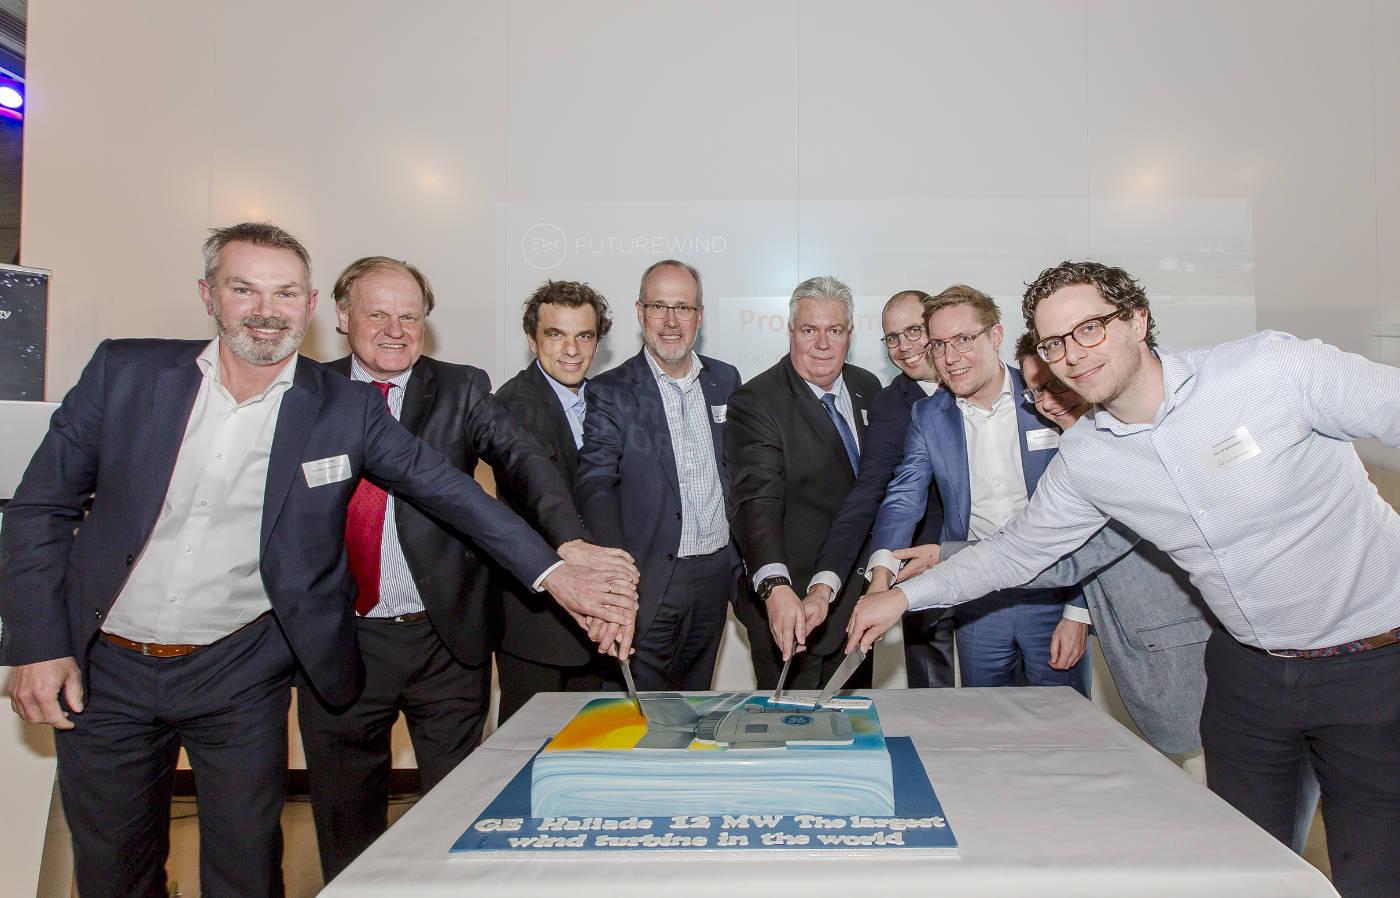 Symbolische openingsceremonie Haliade-X 12 MW